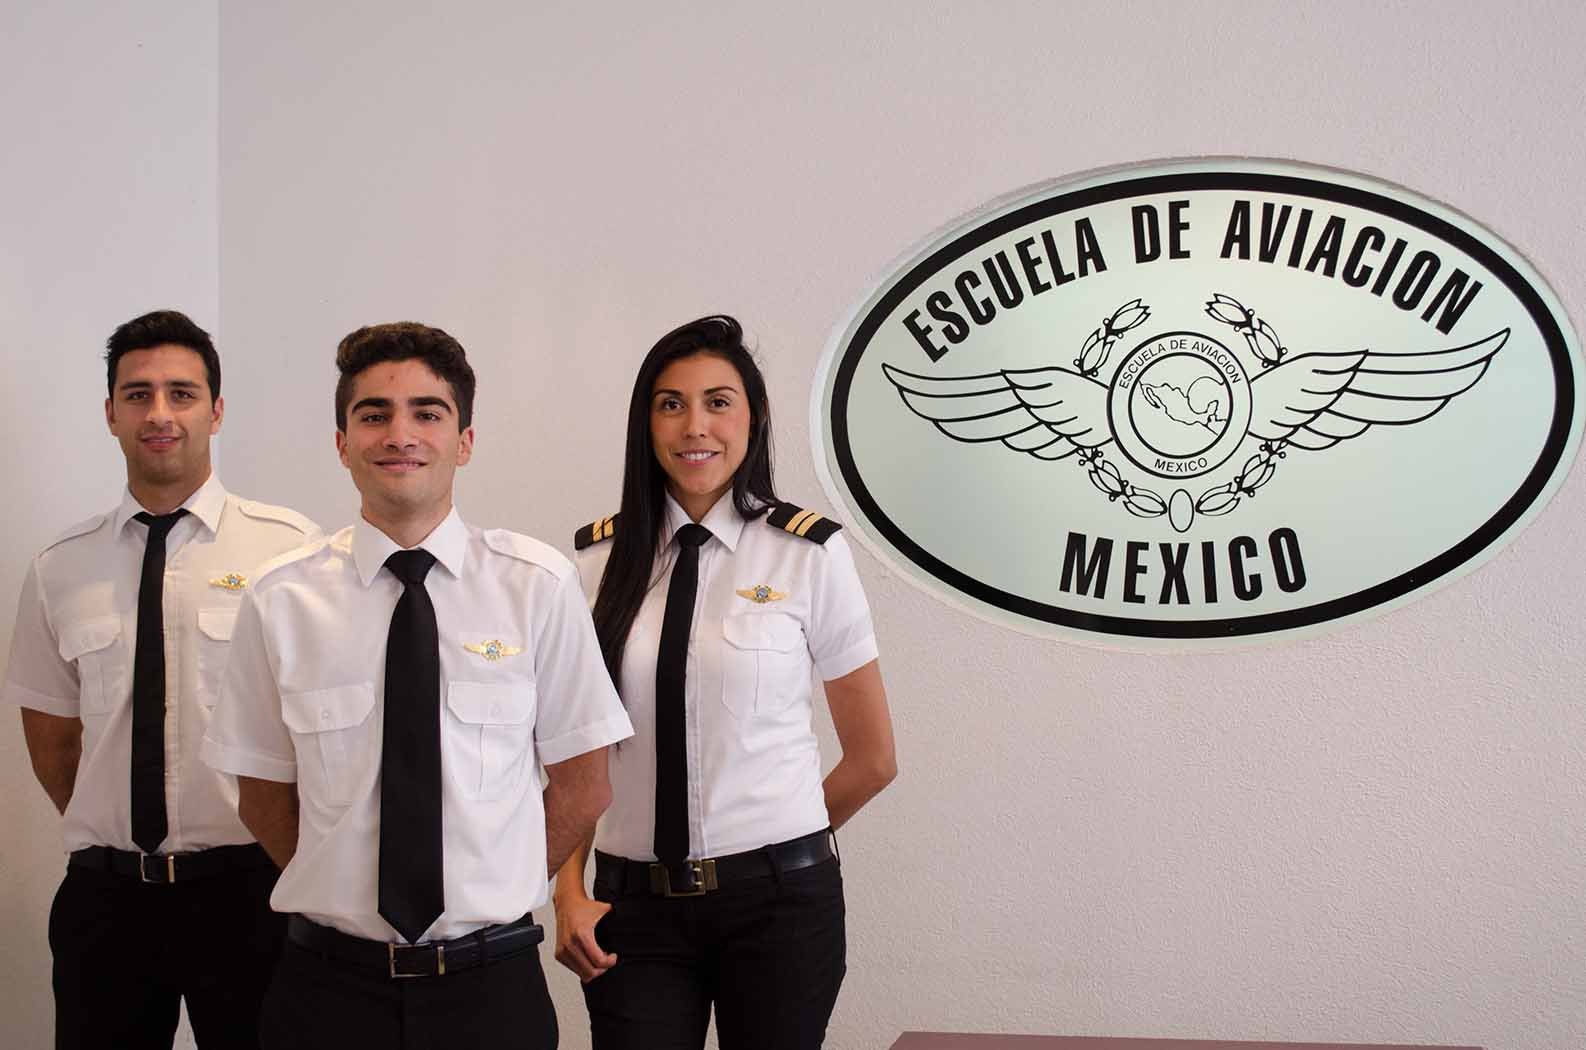 Pilotelever på den mexicanske flyveskole Escuela de Aviacion Mexico. Foto: Airbus